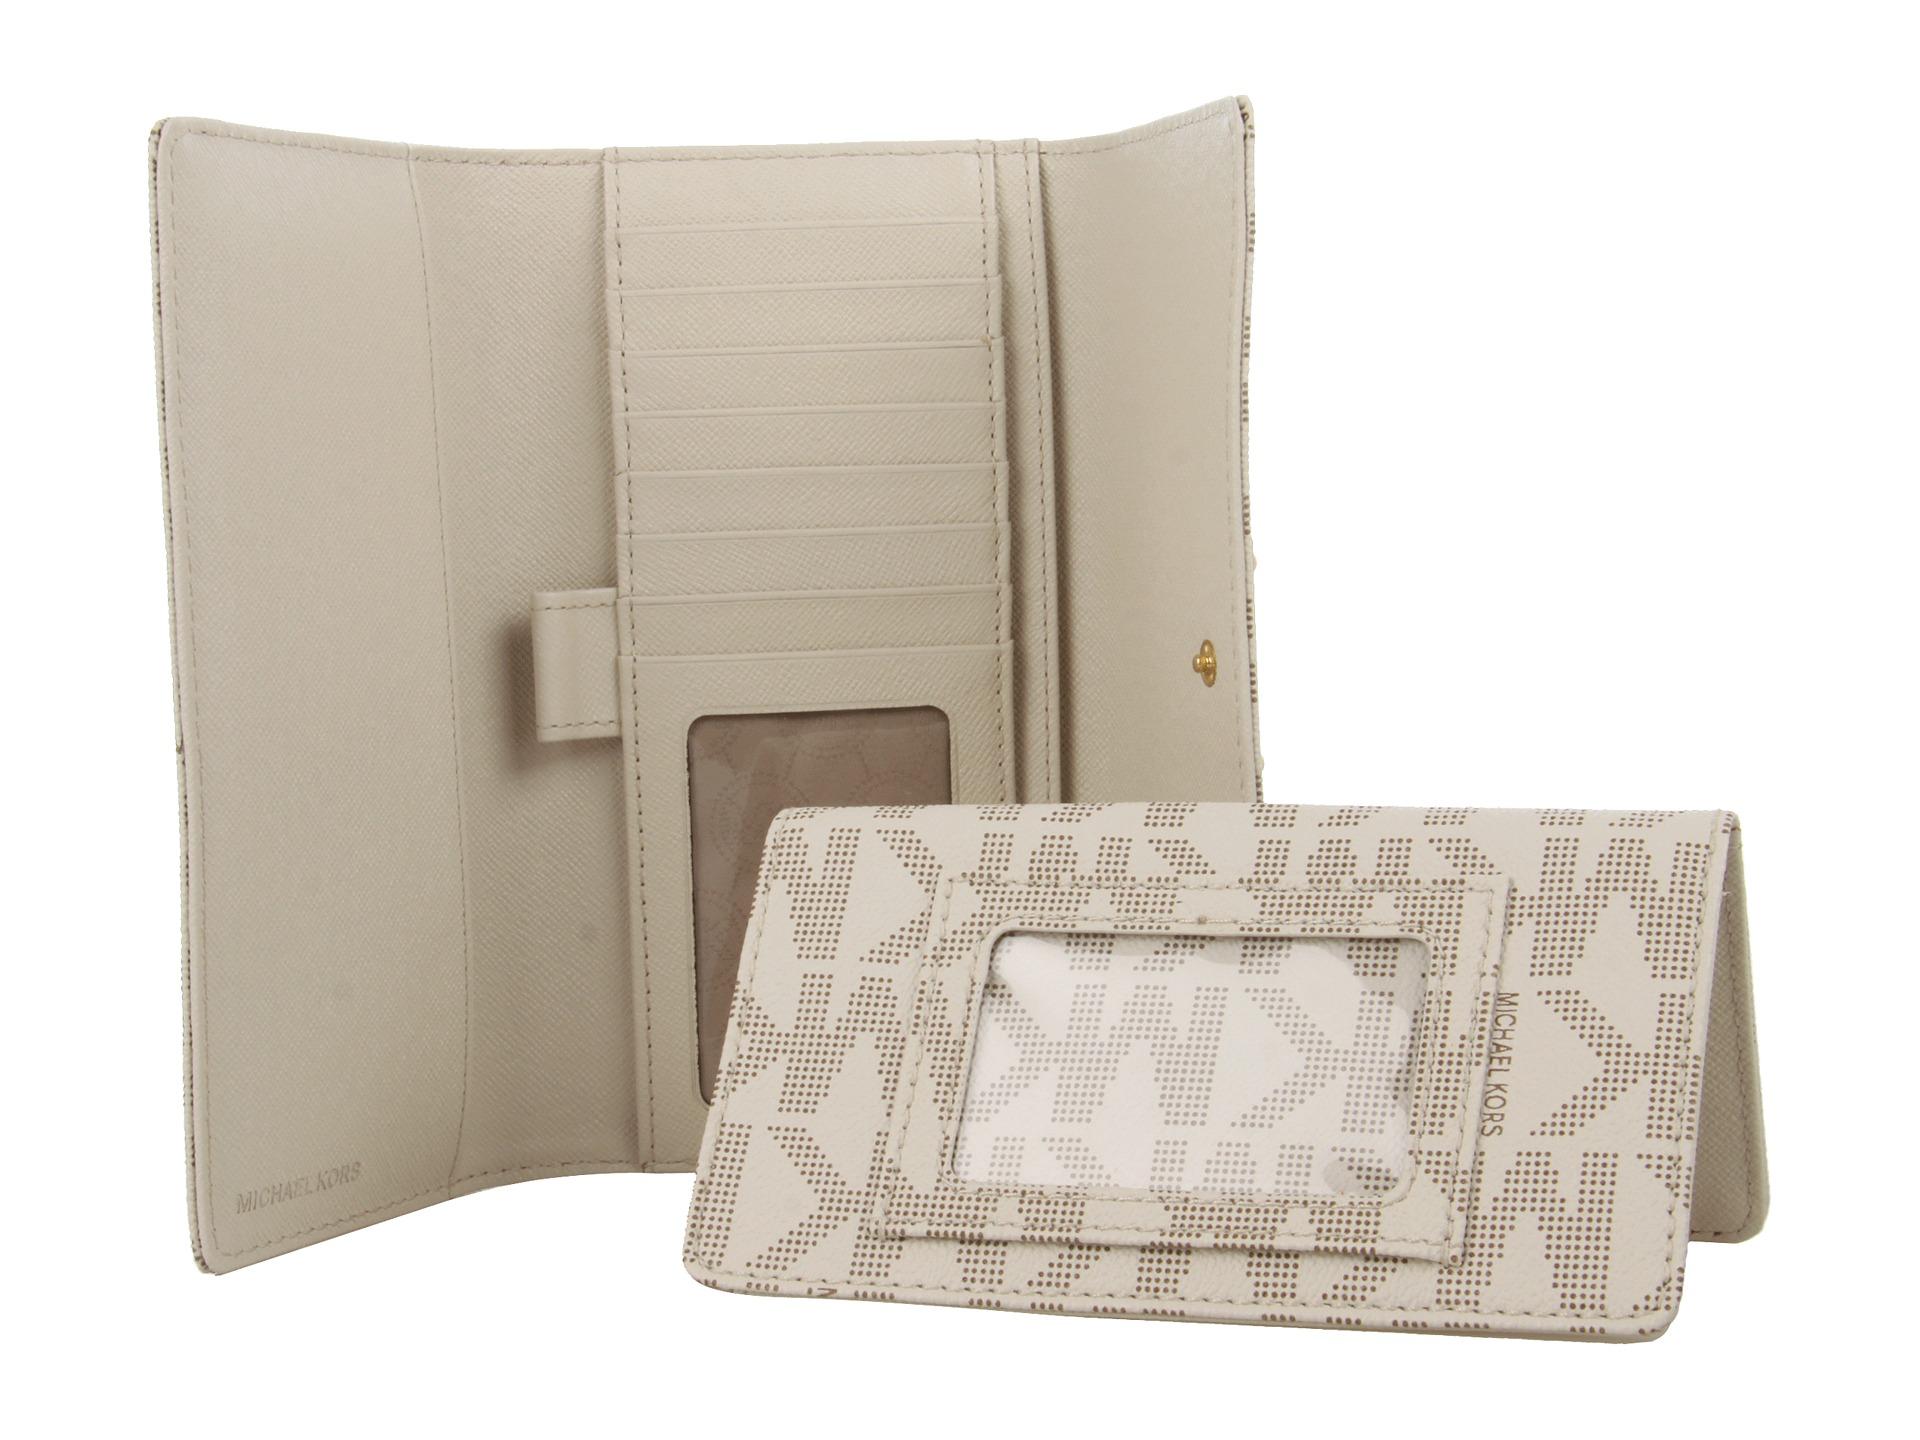 e7cfcec715d0 Michael Kors Wallet Vanilla Logo - The Best Wallet Produck